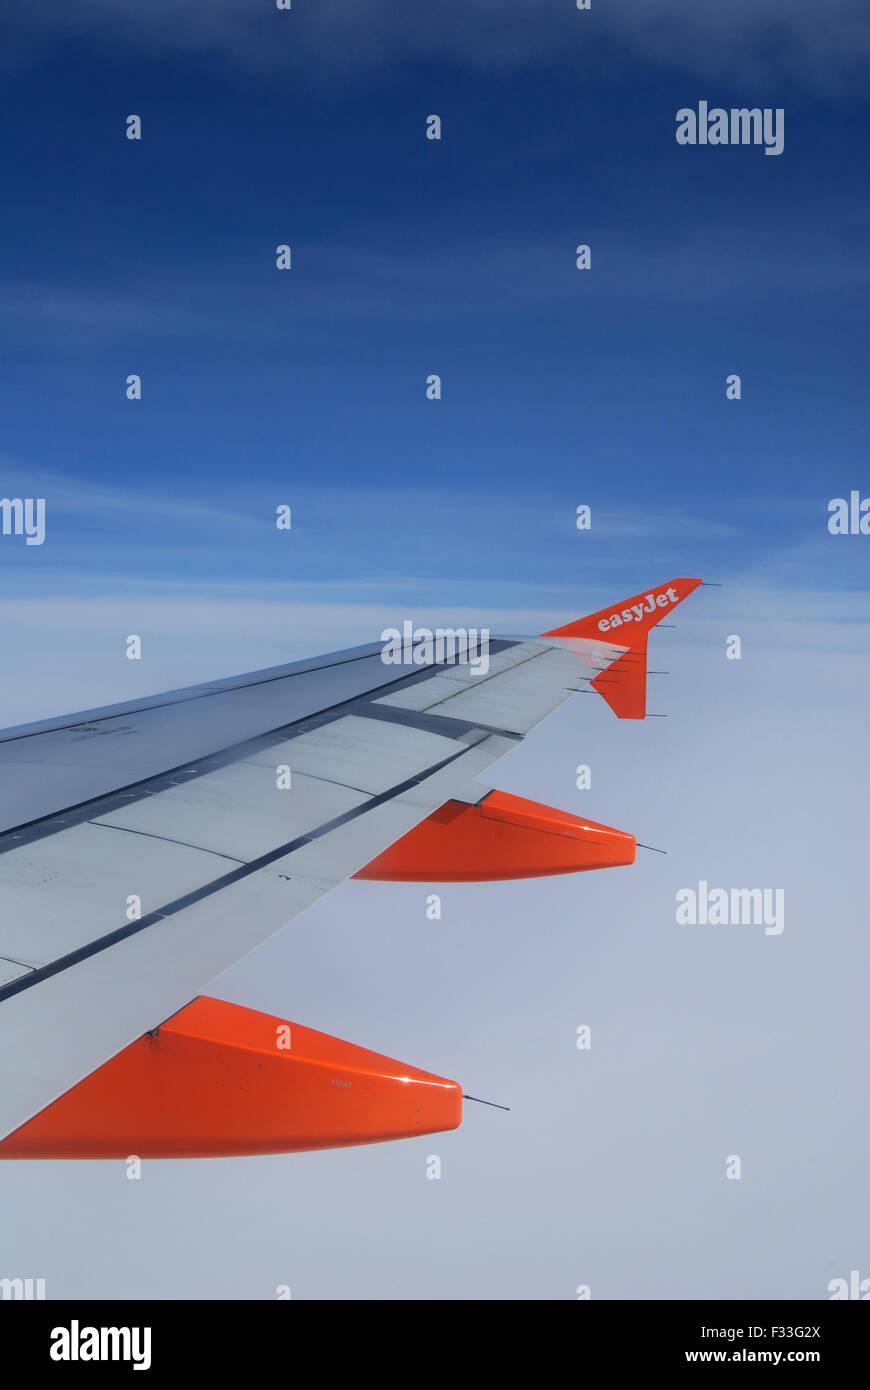 EasyJet Airbus plane in flight - Stock Image